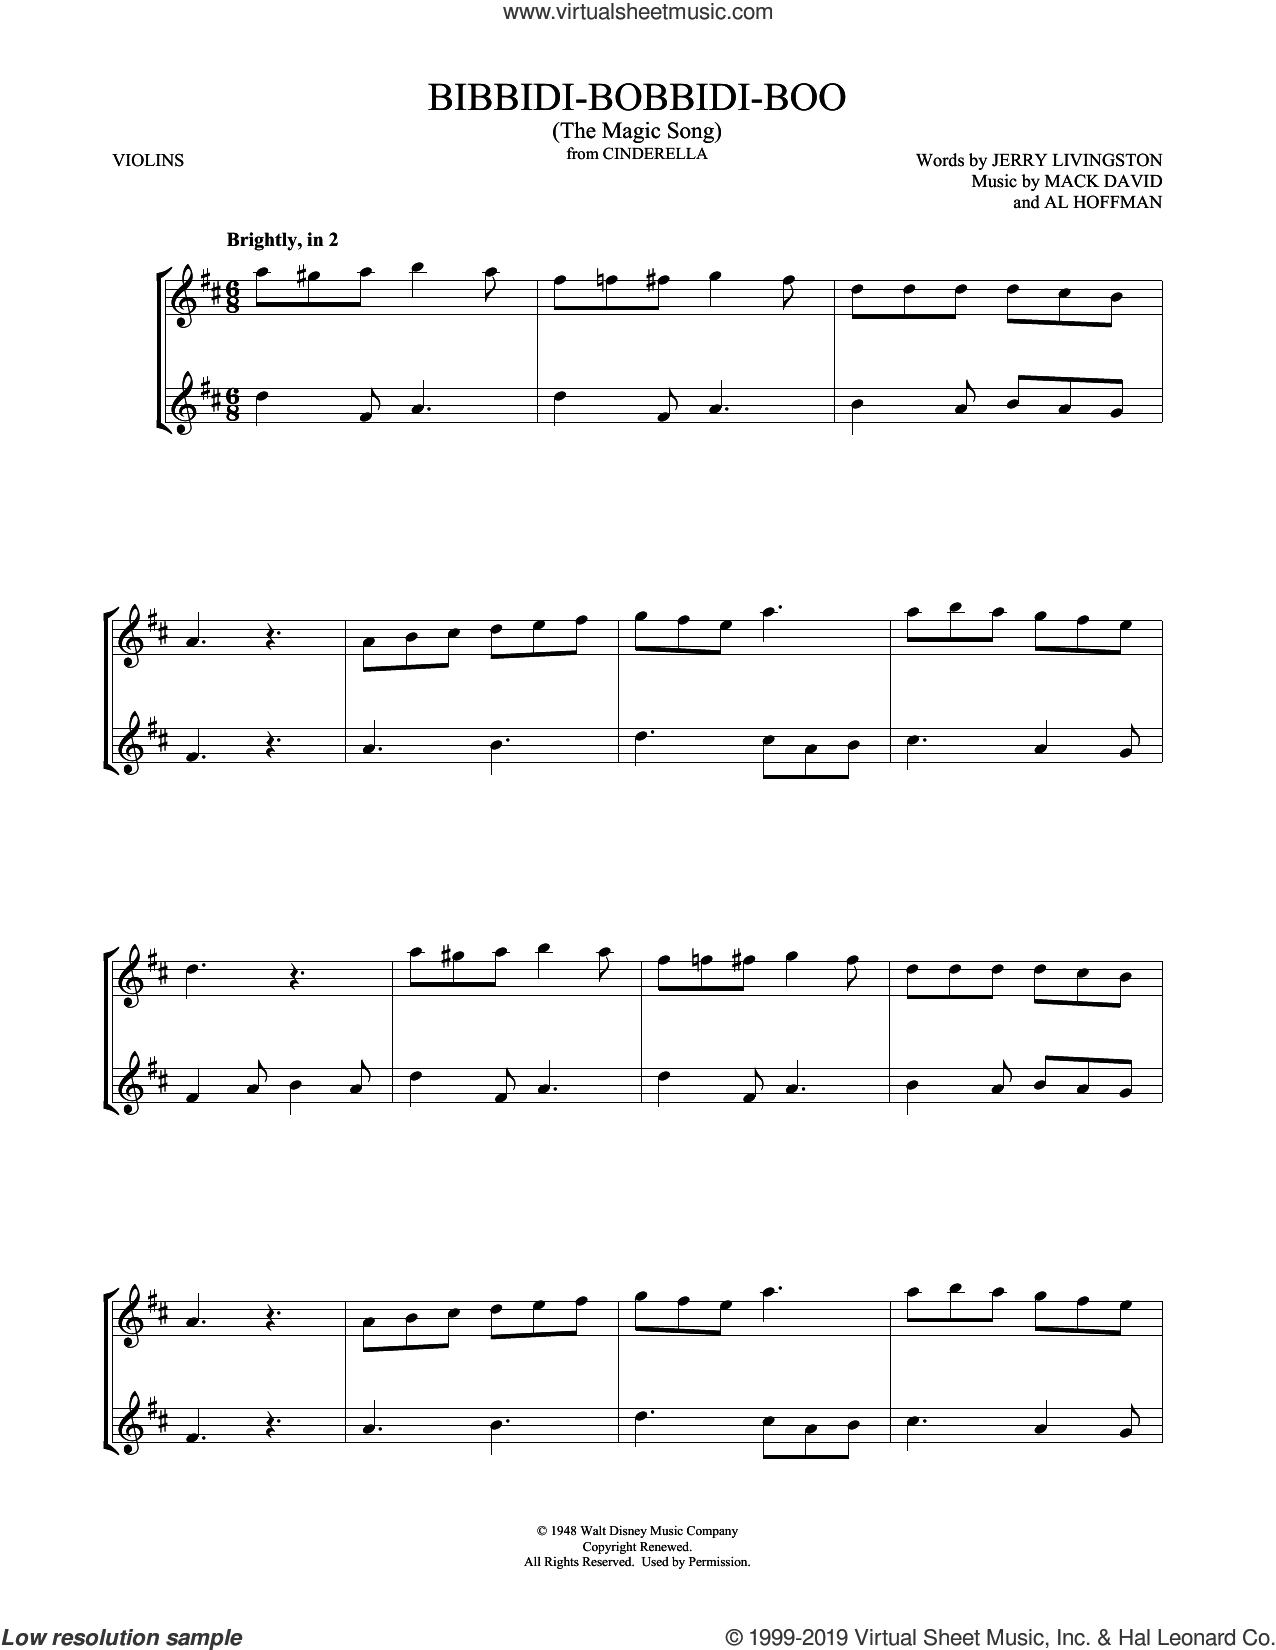 Bibbidi-Bobbidi-Boo (The Magic Song) (from Cinderella) sheet music for two violins (duets, violin duets) by Verna Felton, Mark Phillips, Al Hoffman, Jerry Livingston and Mack David, intermediate skill level